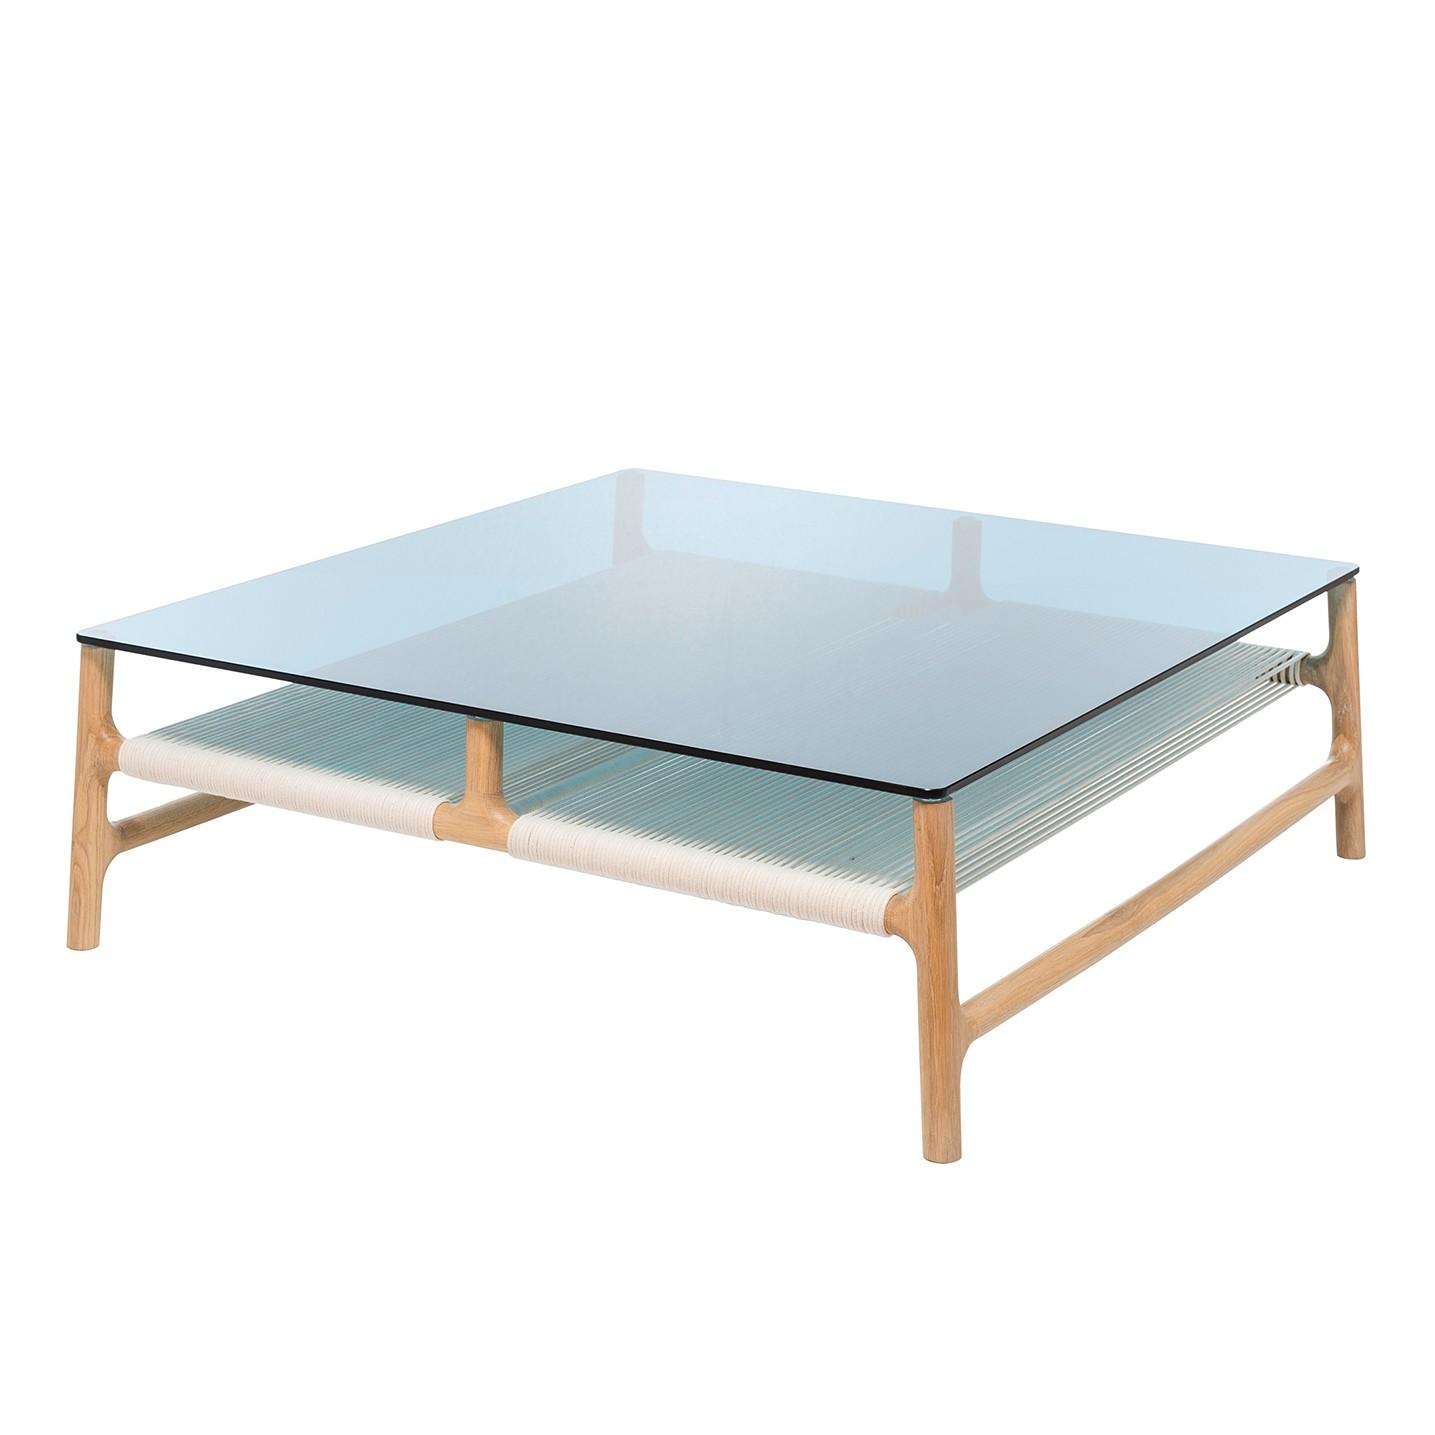 Table basse Fawn - Verre / Chêne massif - Chêne / Bleu, Gazzda